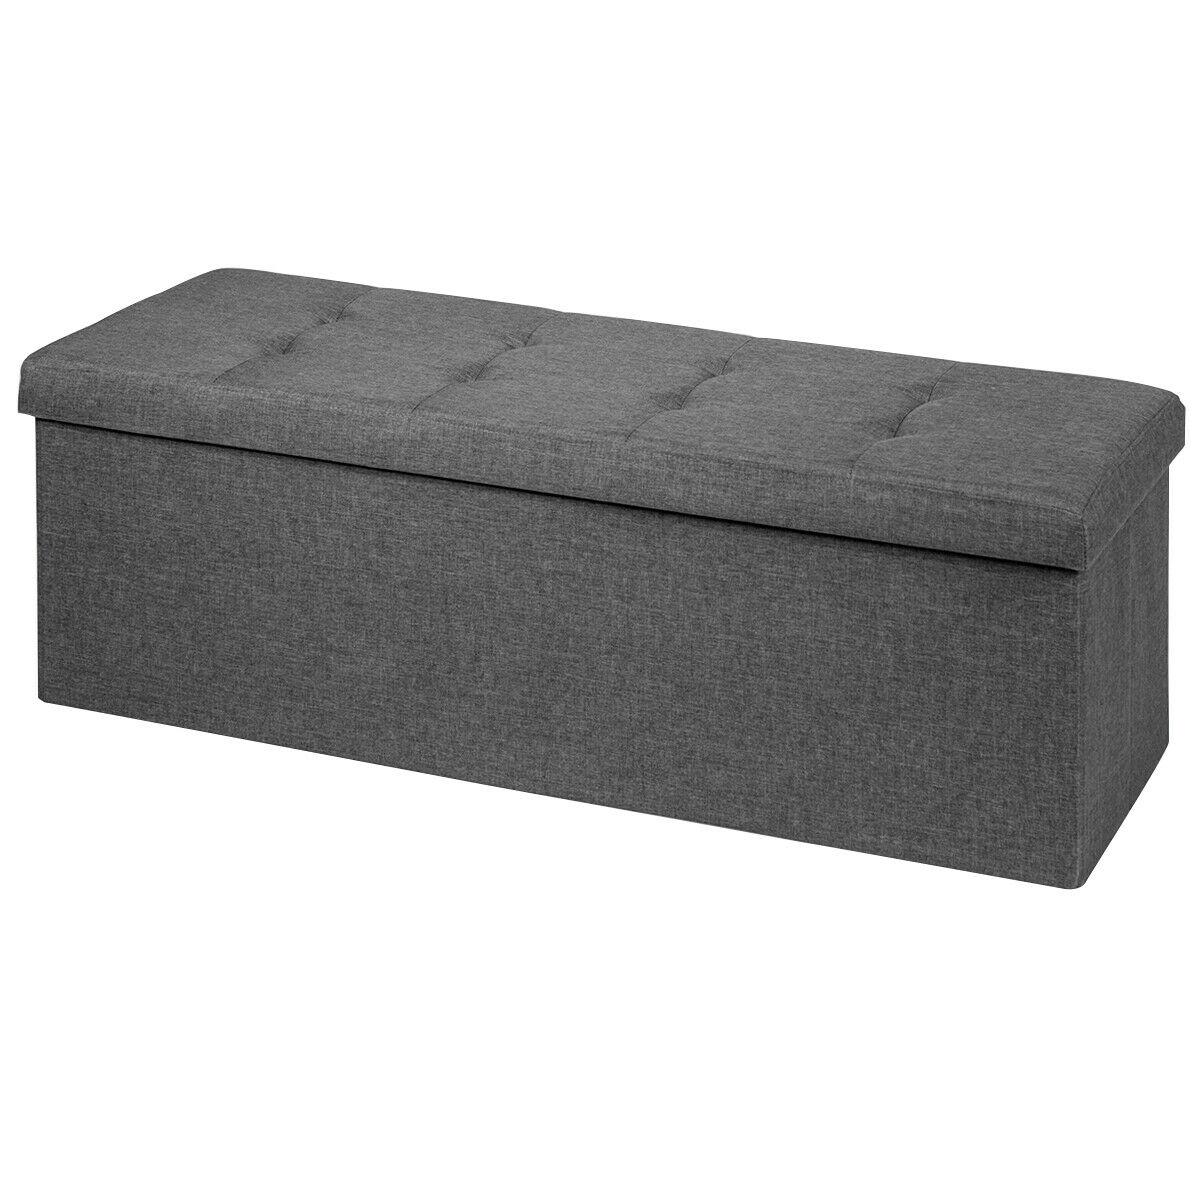 sobuy fsr30 w storage bench 3 drawers Fabric Folding Storage Ottoman Storage Chest W/Divider Bed End Bench Drak Grey  HW65883GR